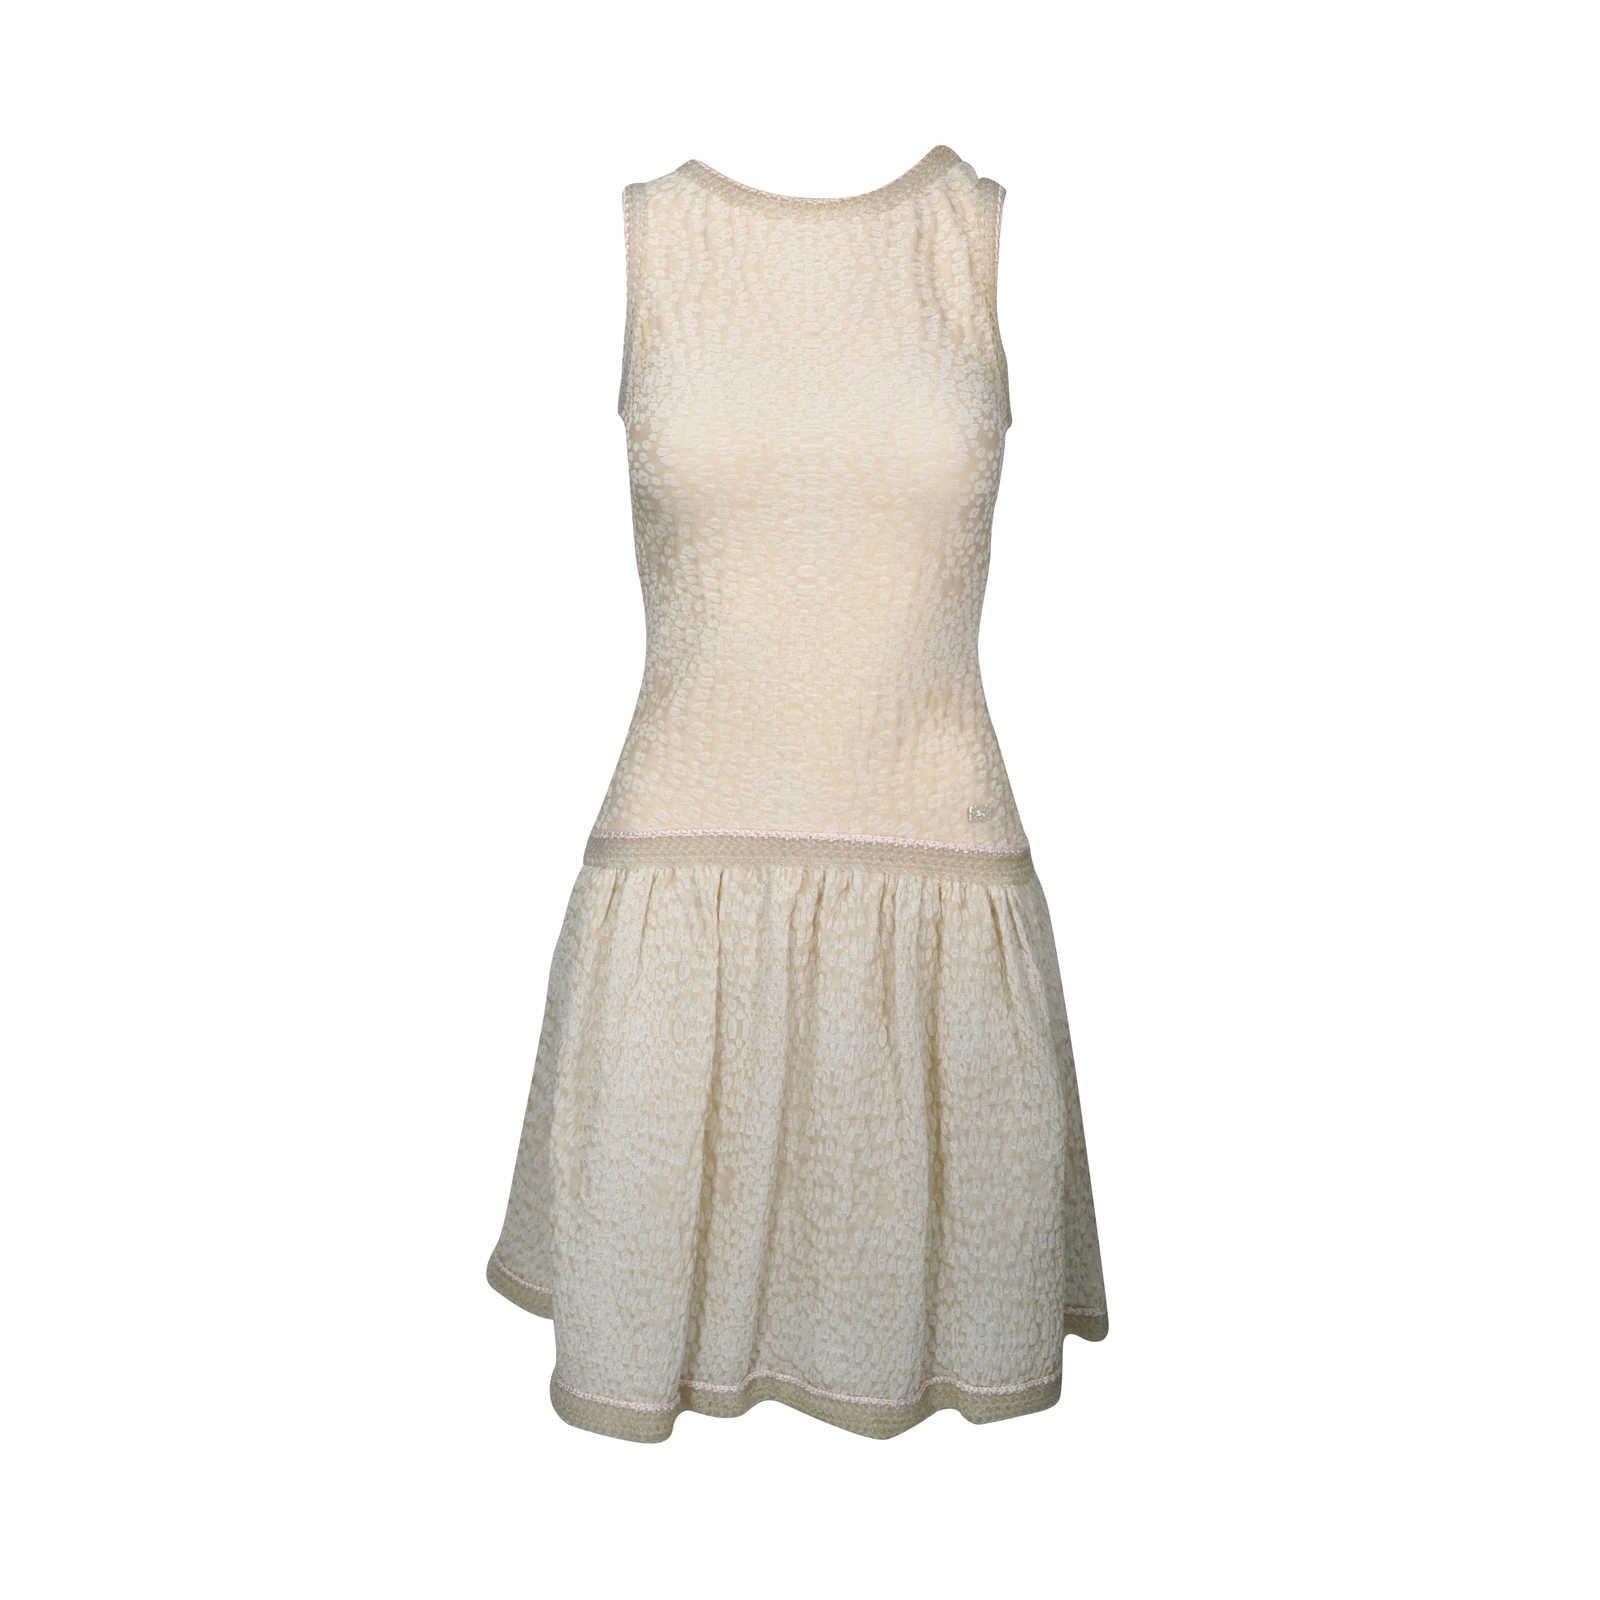 chanel-rubber-trim-knit-dress-1.jpg